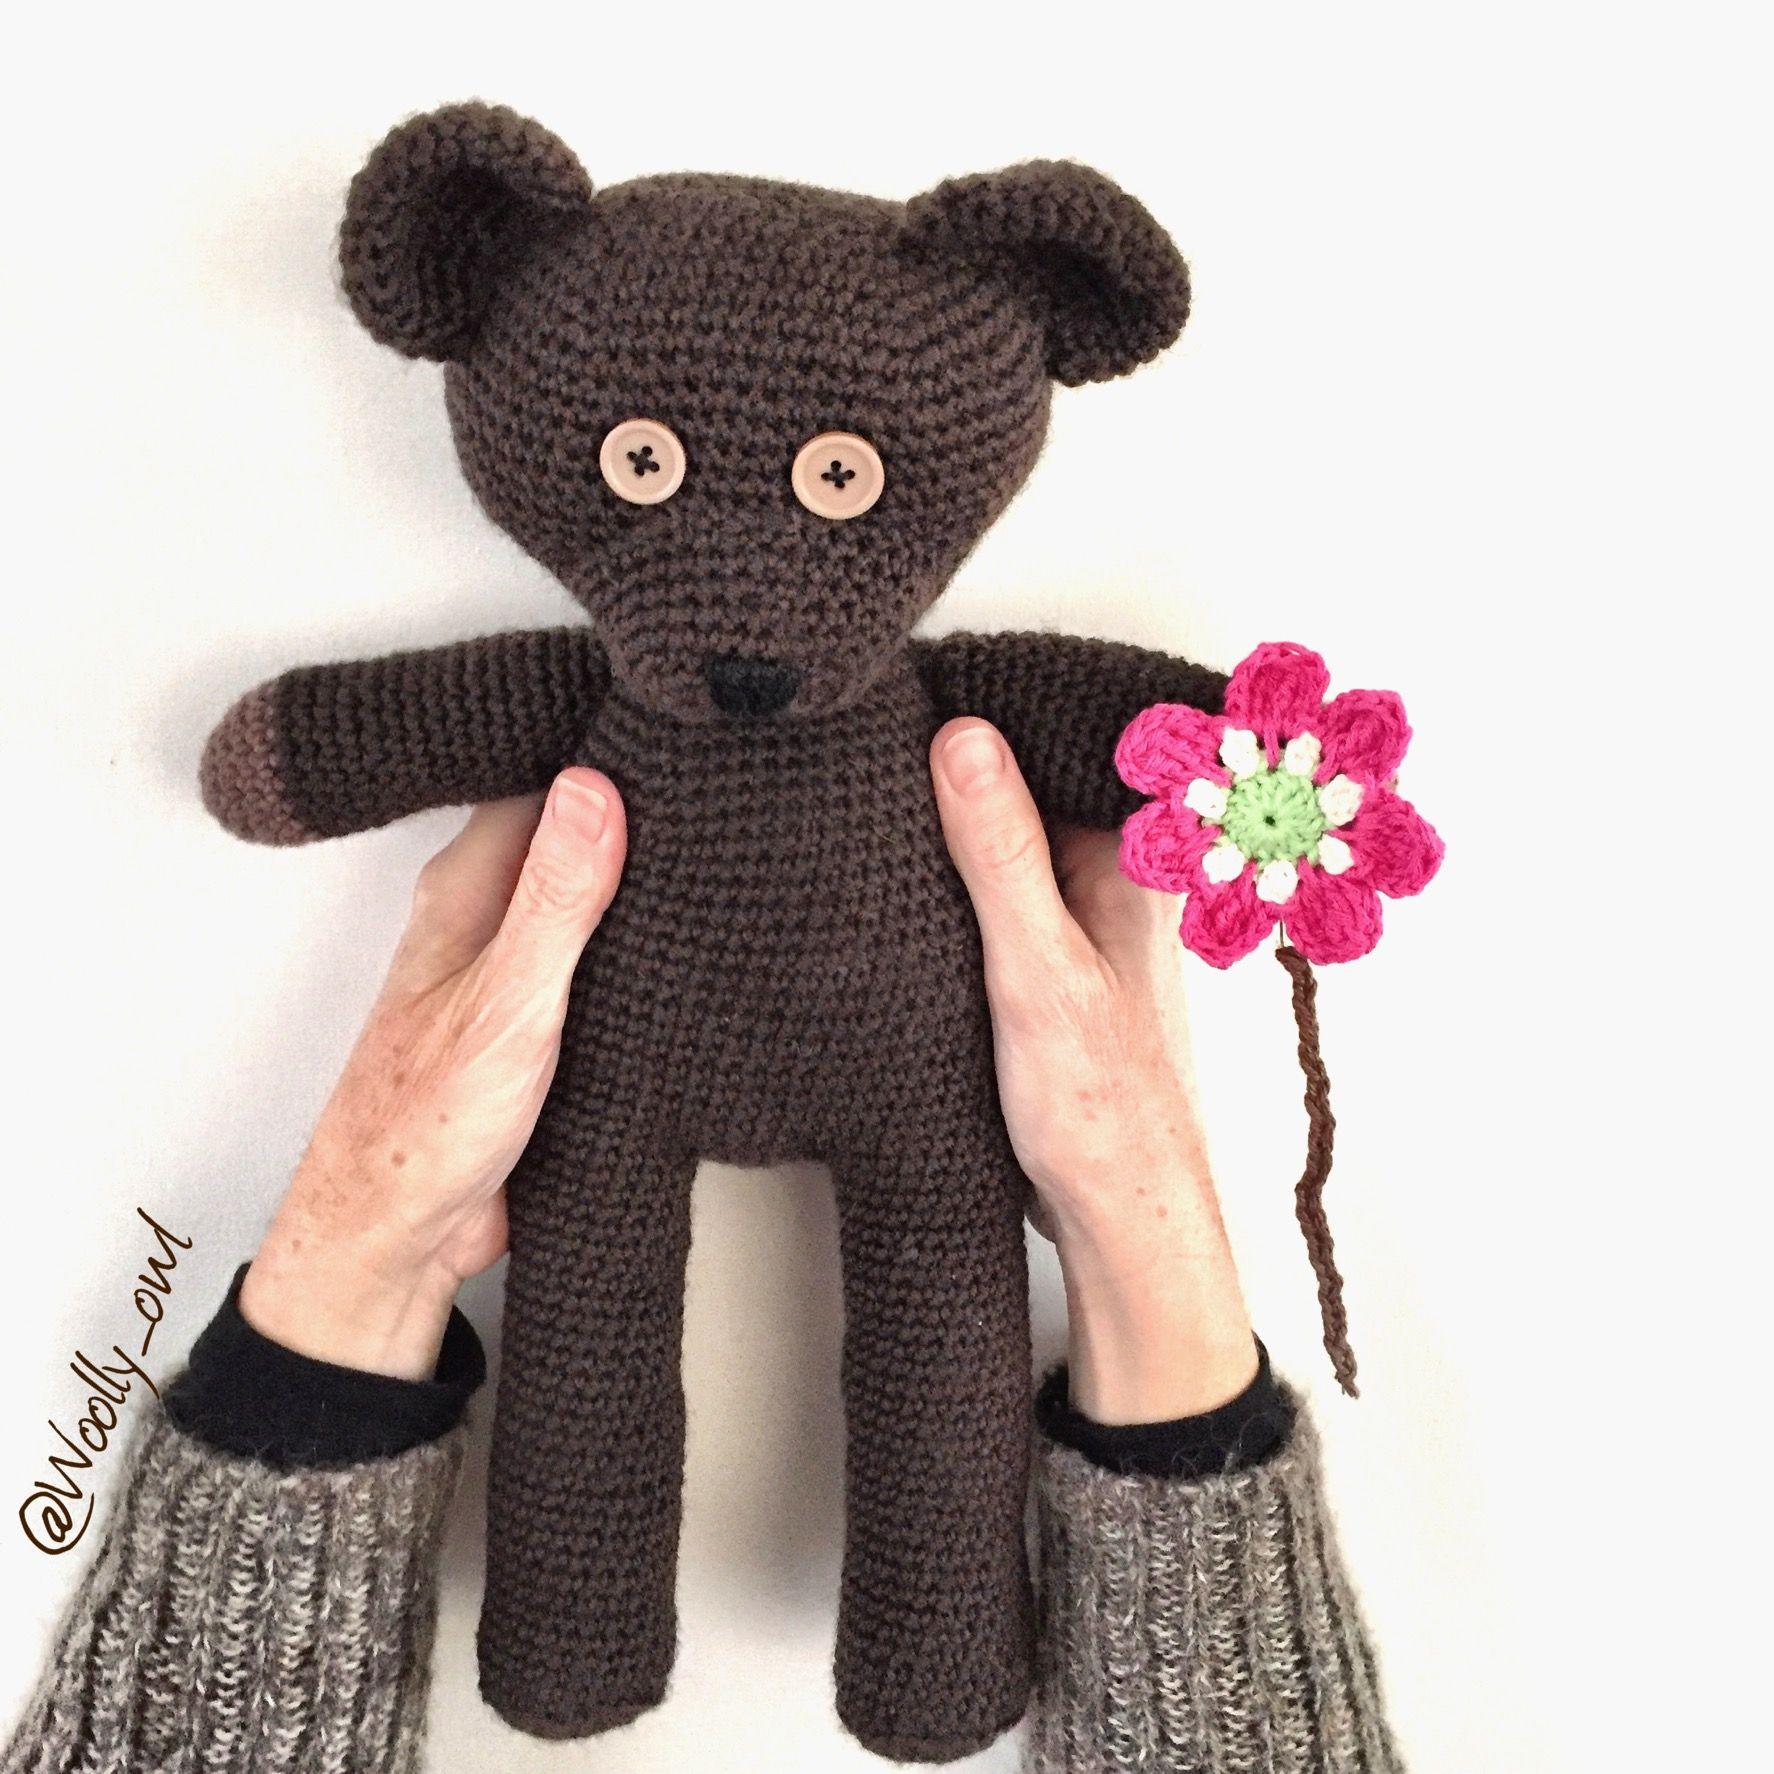 mr bean teddy 100 wool 3 mm hook pattern by andrea. Black Bedroom Furniture Sets. Home Design Ideas